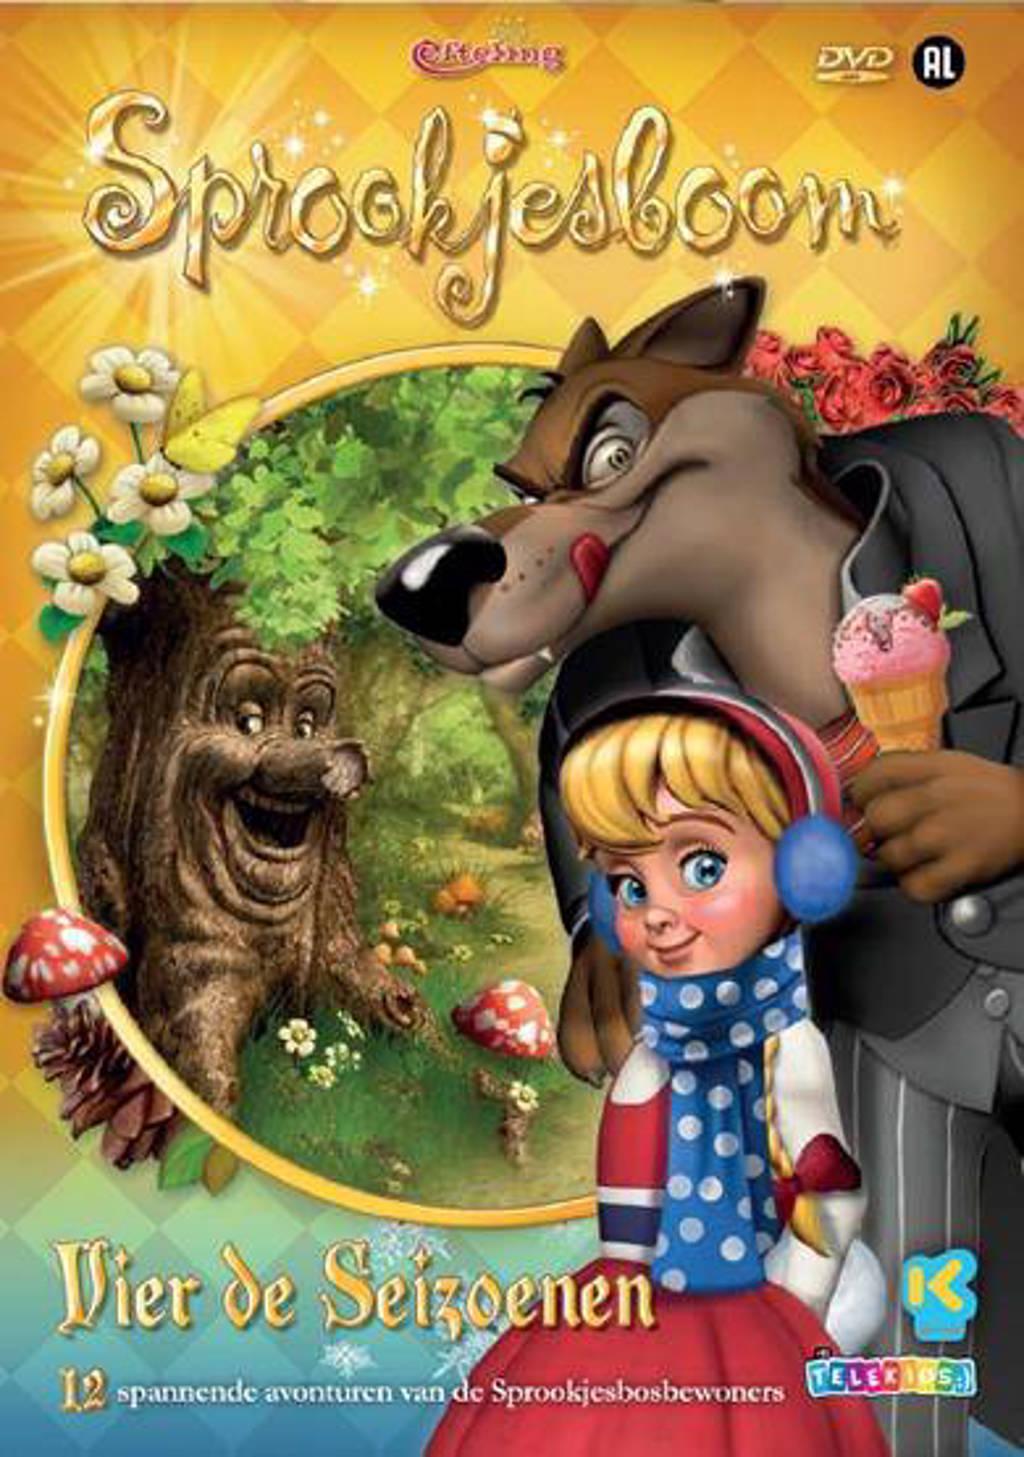 Sprookjesboom - Vier de seizoenen (DVD)